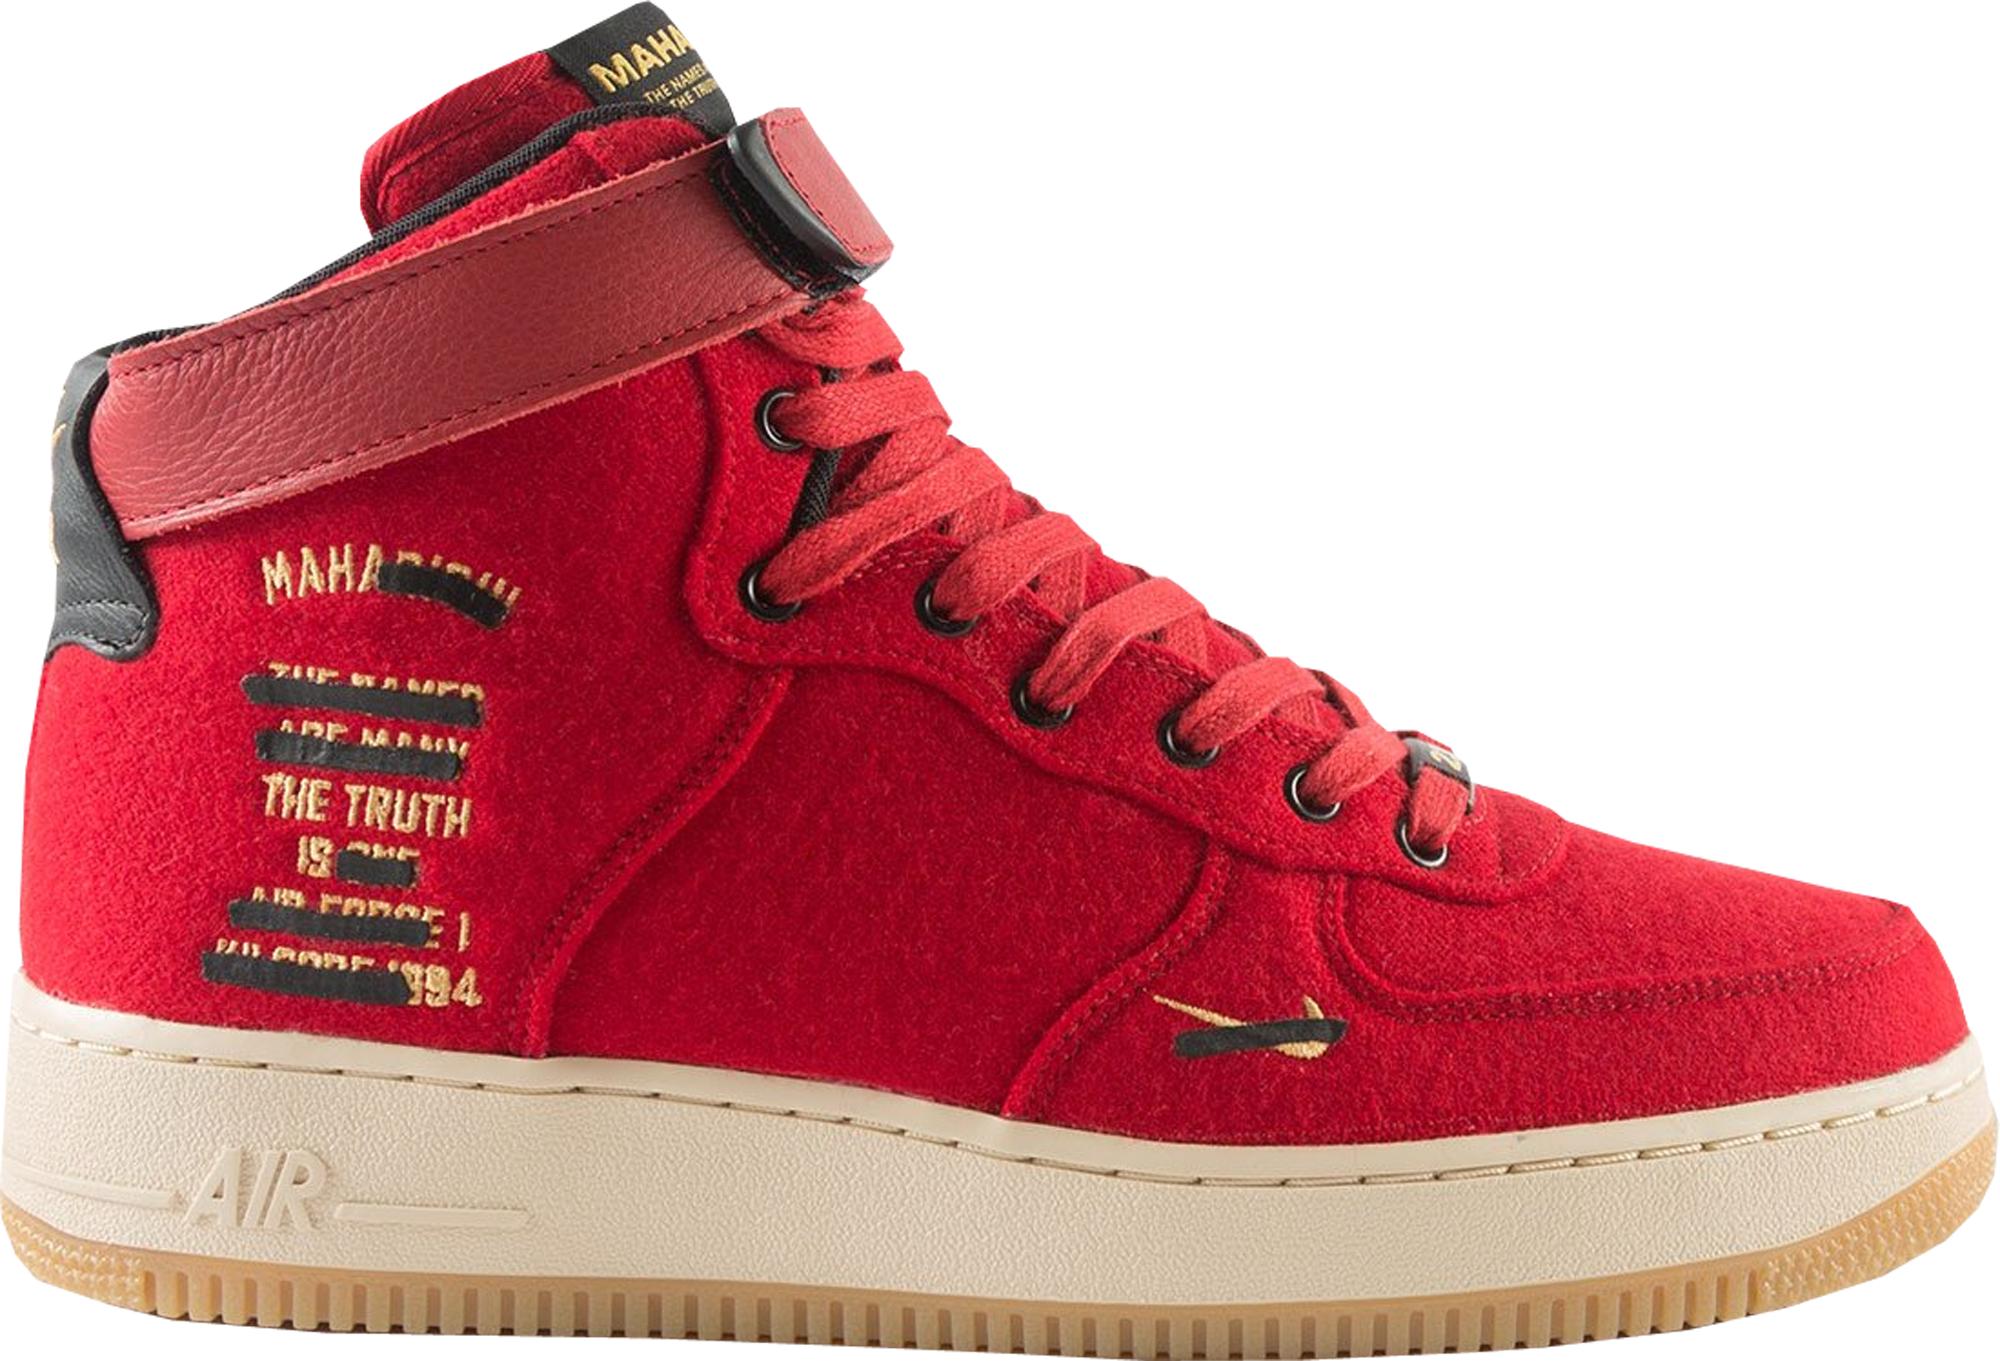 Nike Air Force 1 High maharishi Red